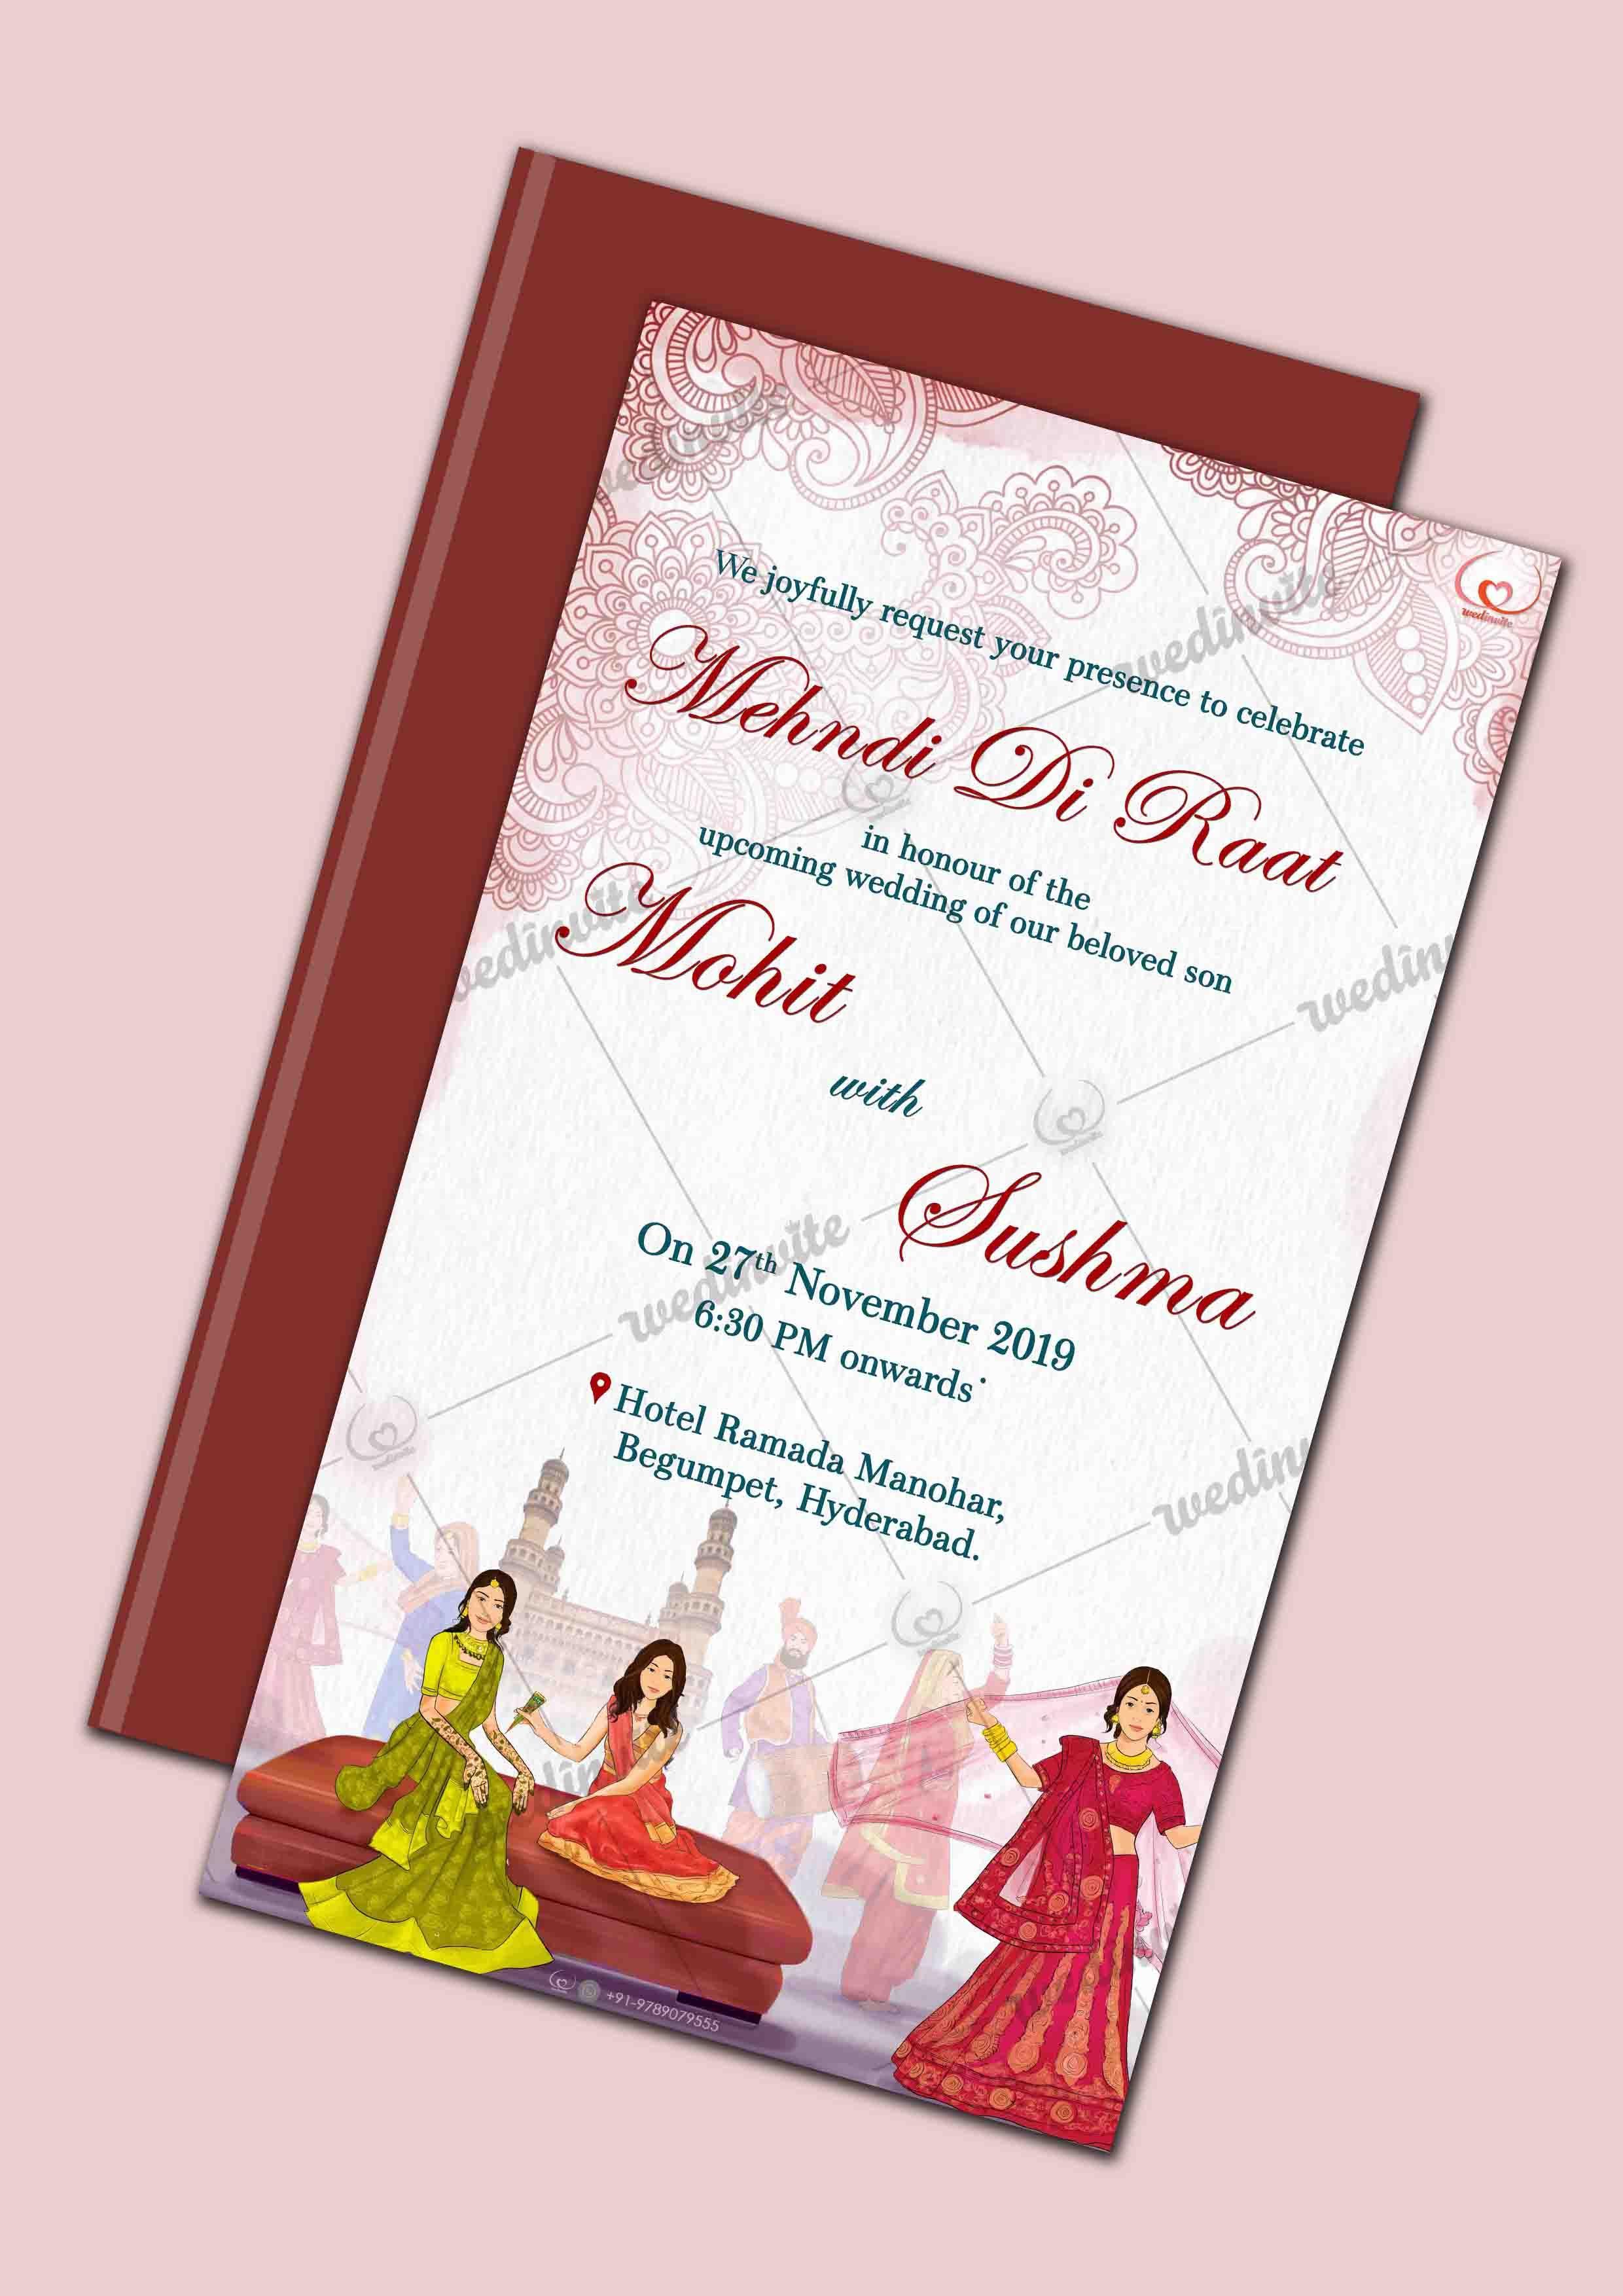 Traditional Mehndi Invite Wedding Invitation Card Design Wedding Invitation Cards Invitation Card Design